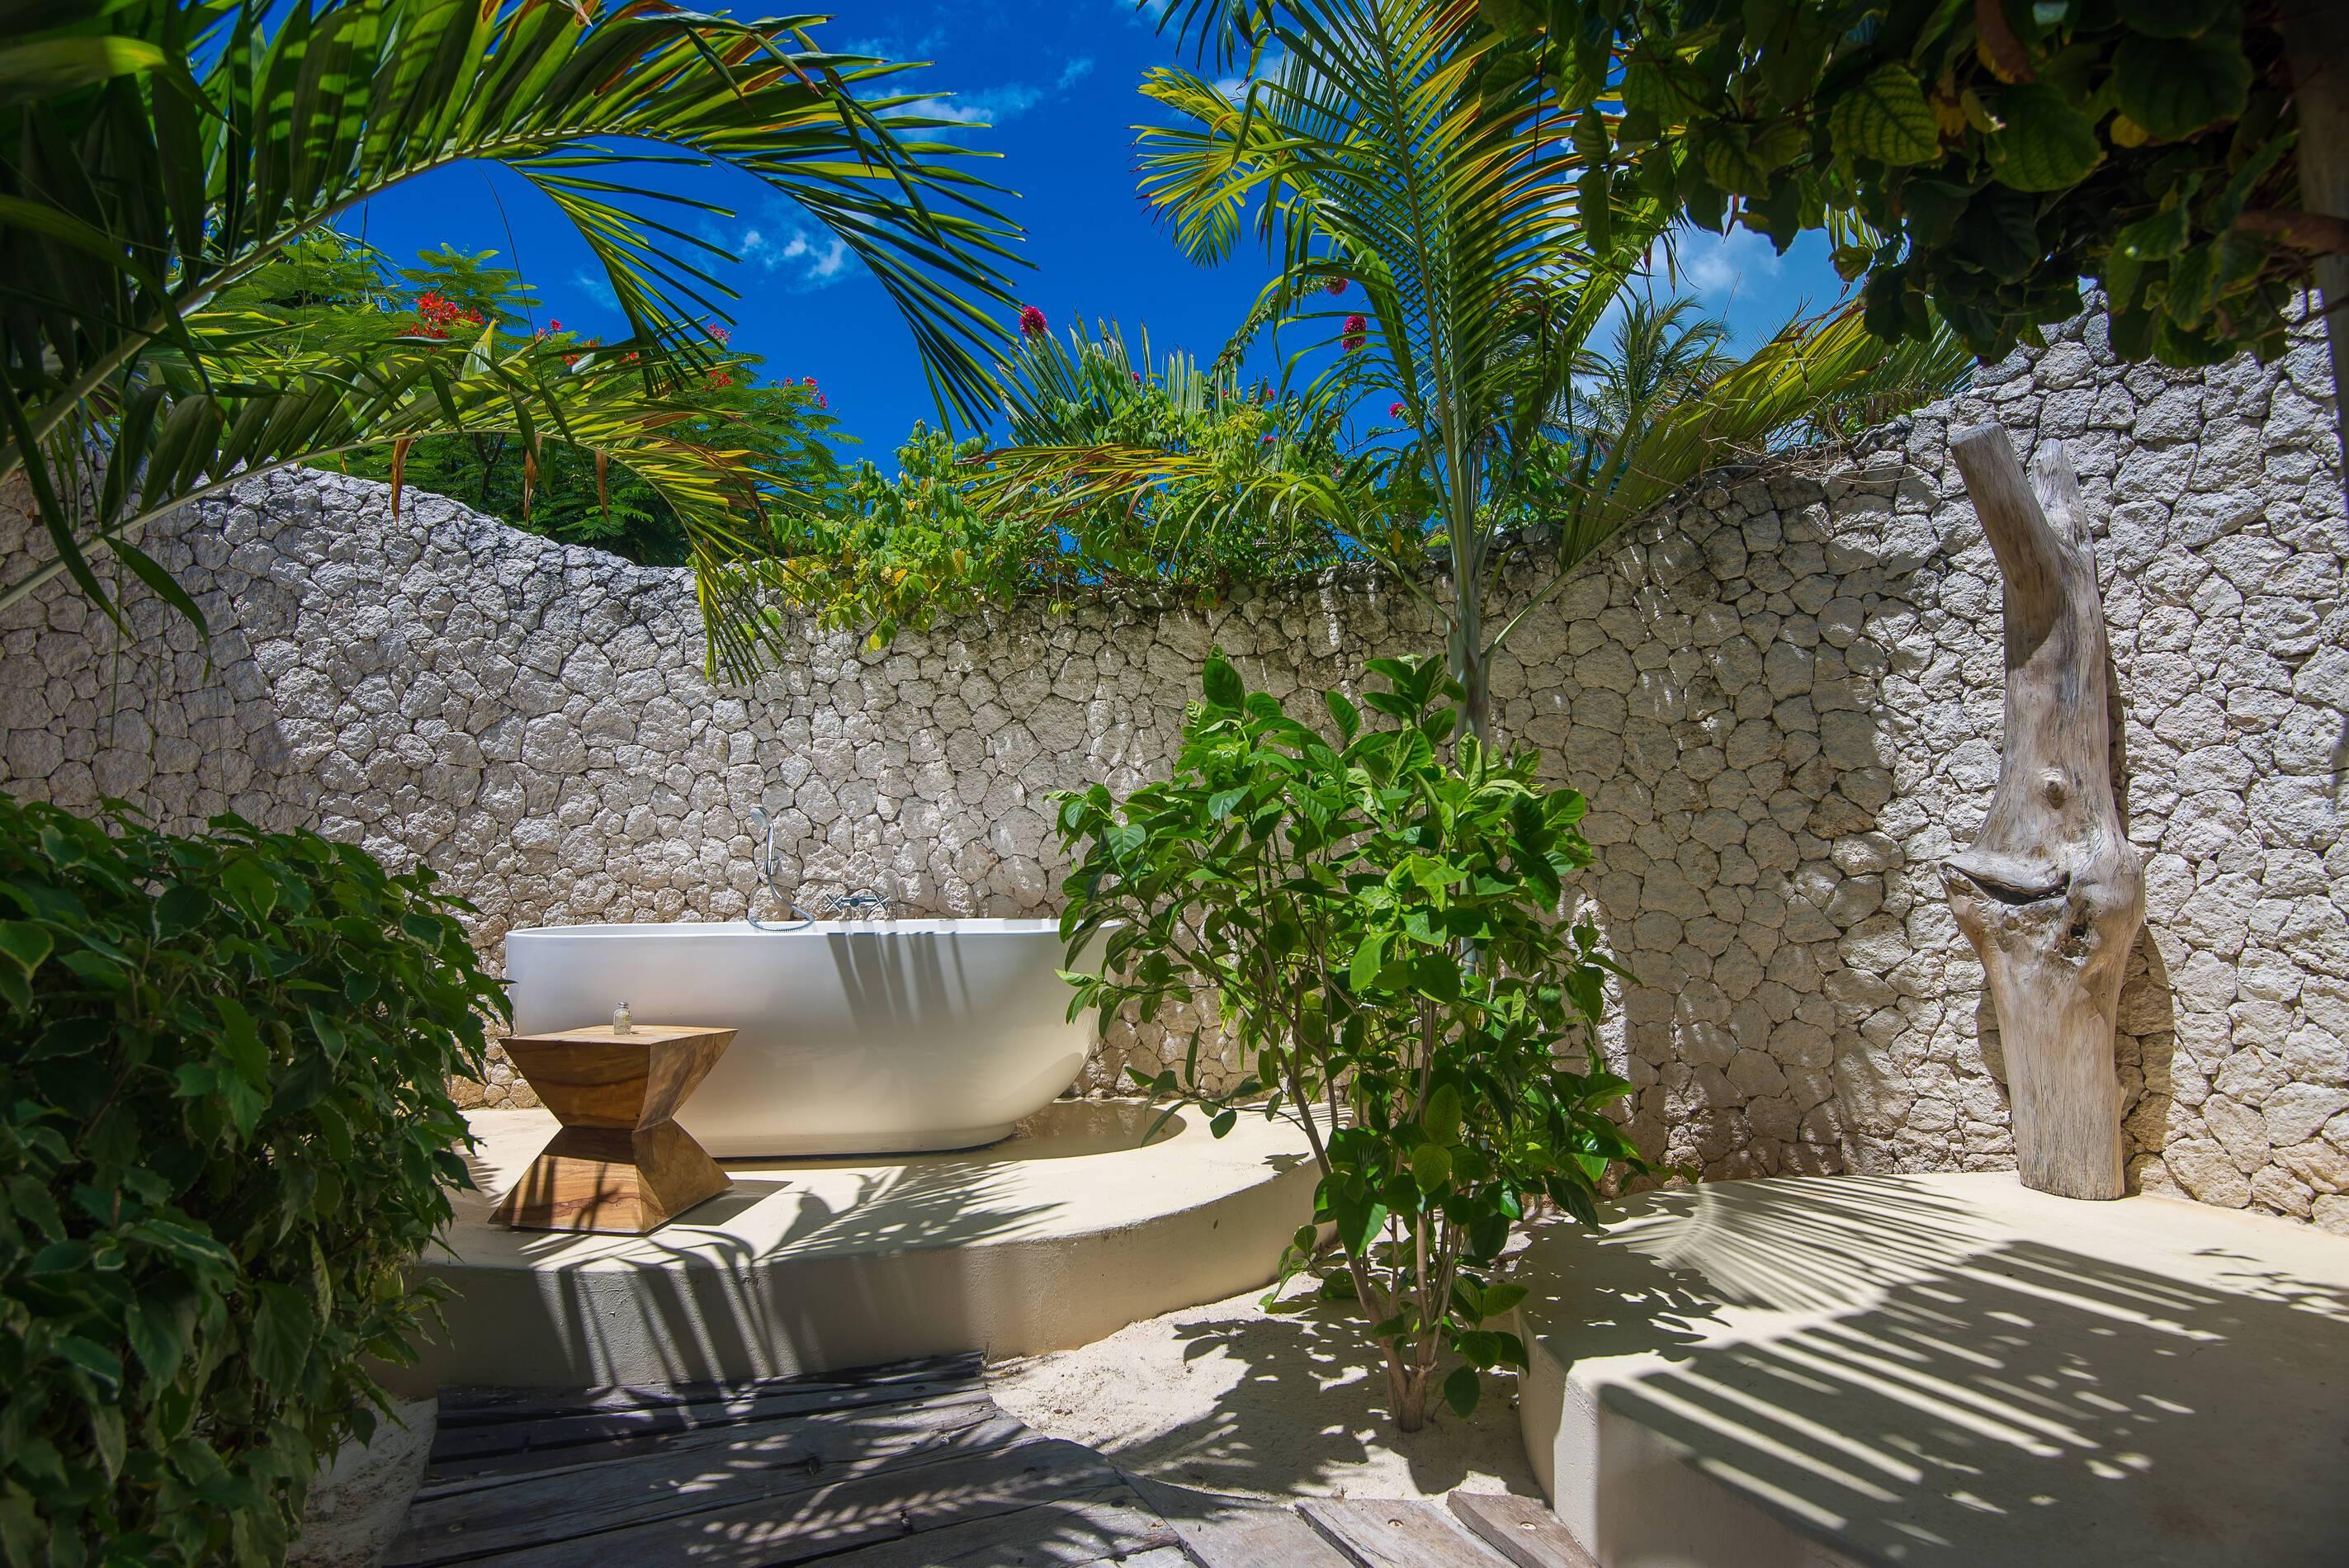 White Sand Zanzibar Salle Bains Exterieure